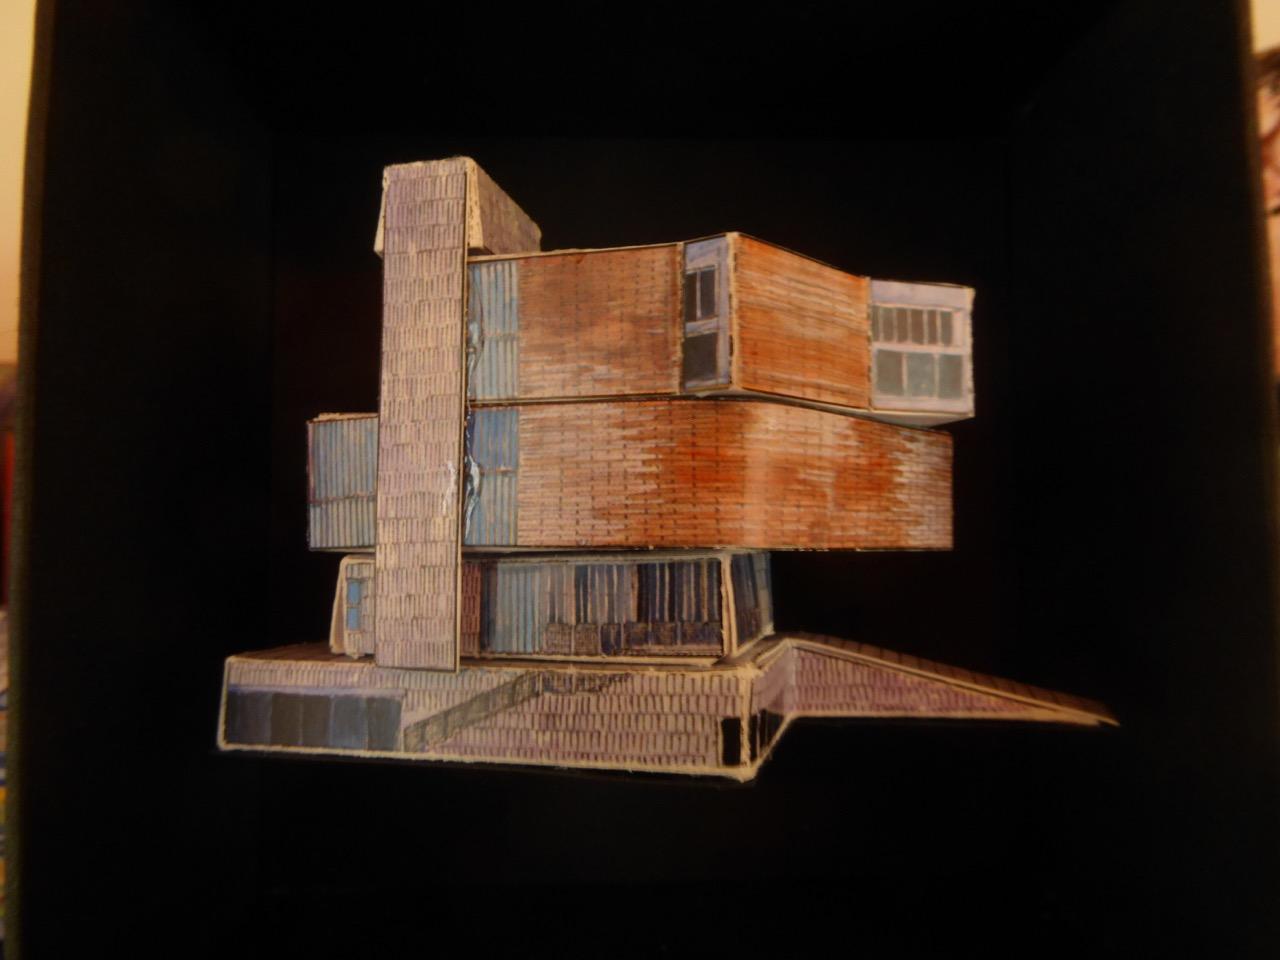 Glucksman Gallery in box